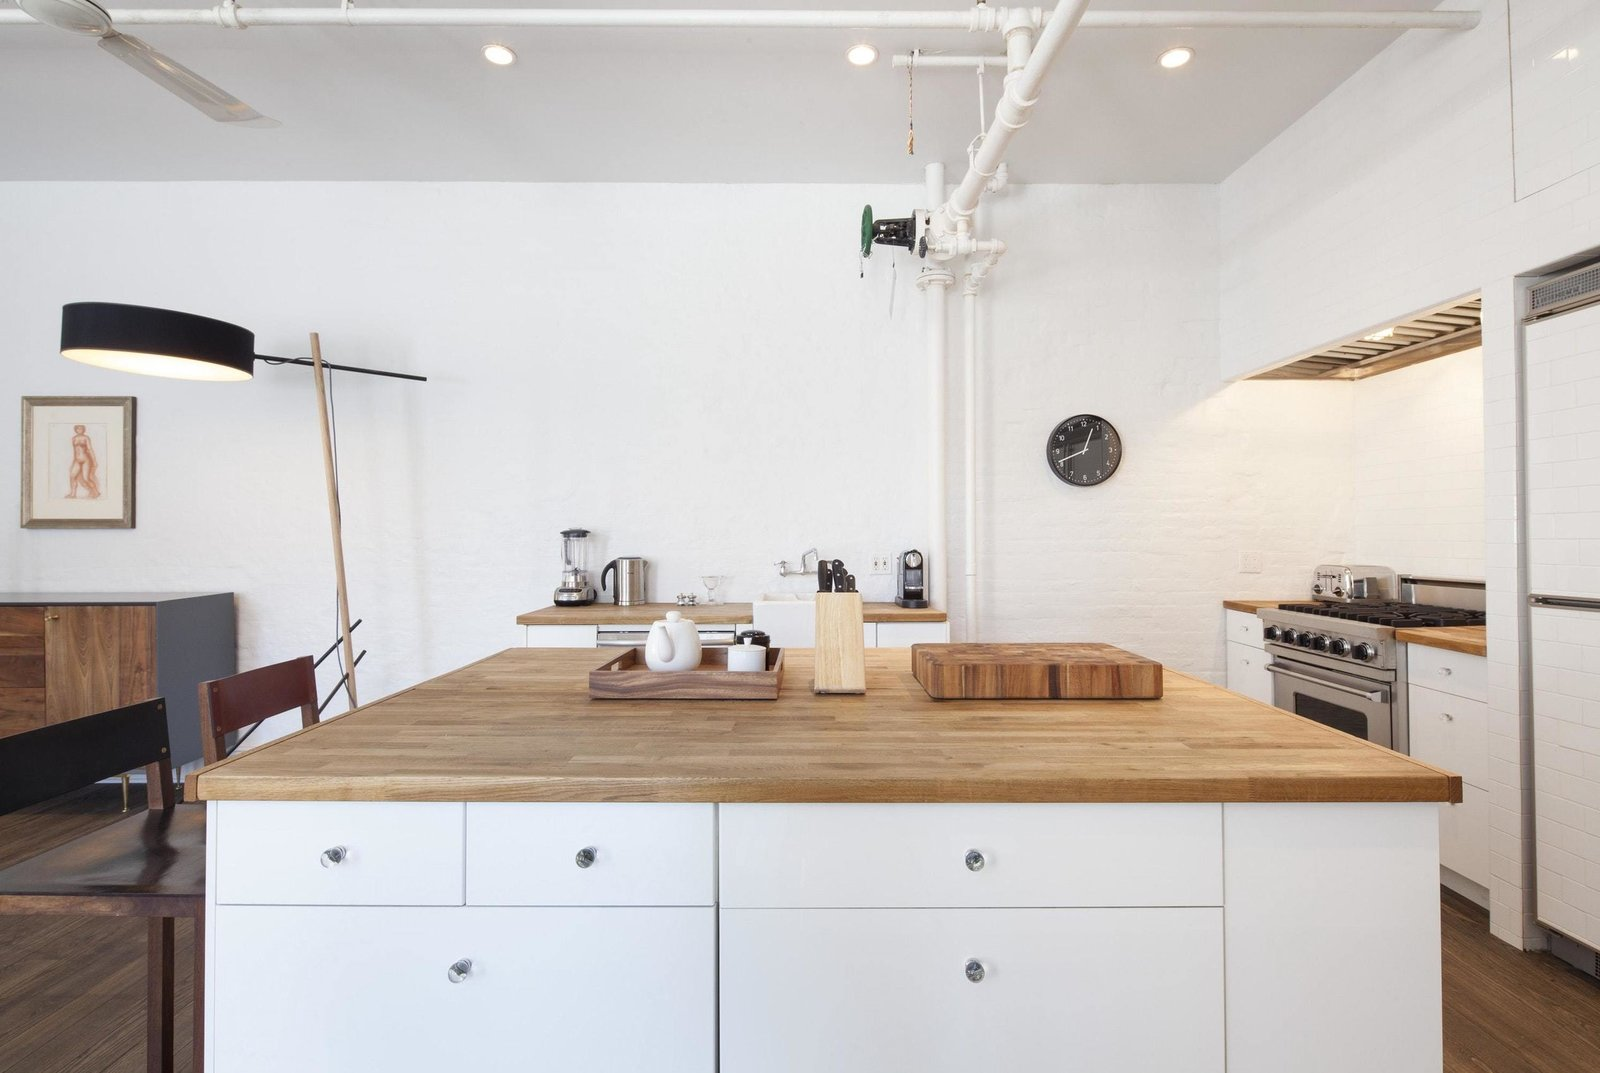 Kitchen, Range, White Cabinet, Medium Hardwood Floor, Vessel Sink, Wood Counter, Wall Oven, Recessed Lighting, and Refrigerator  Prince Street